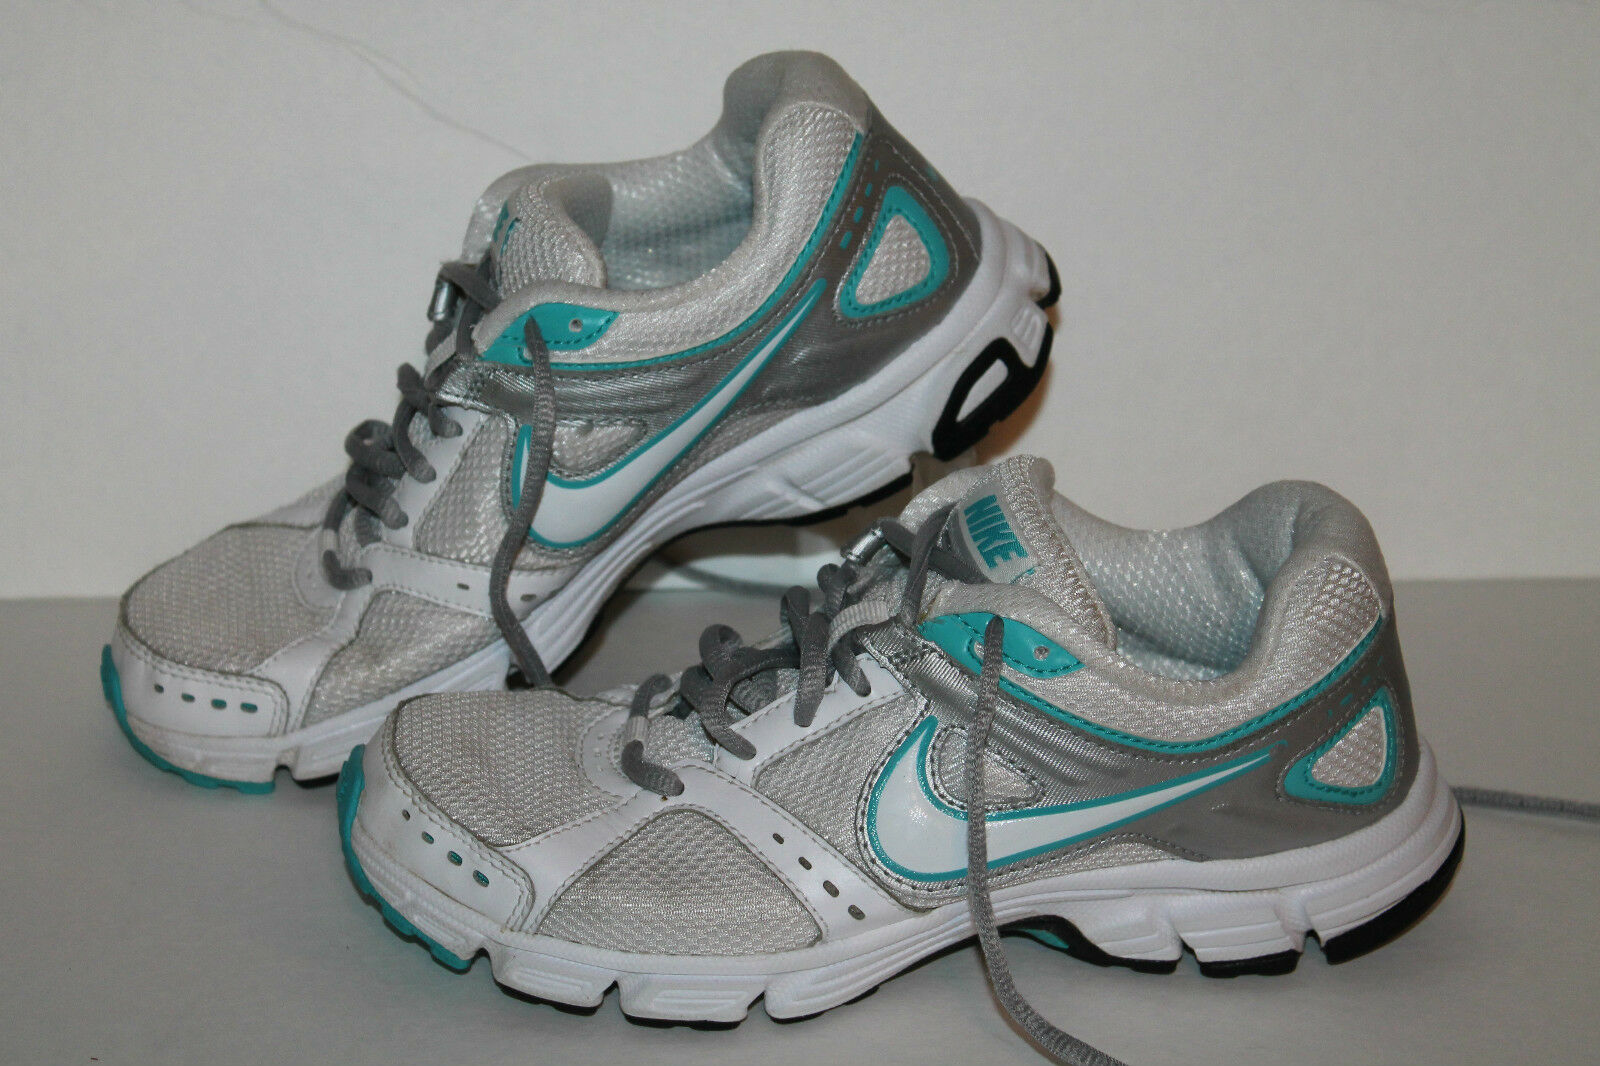 Nike Air Downshifter 4 Running Shoes, Wht/Turq/Slvr, Womens US 6.5